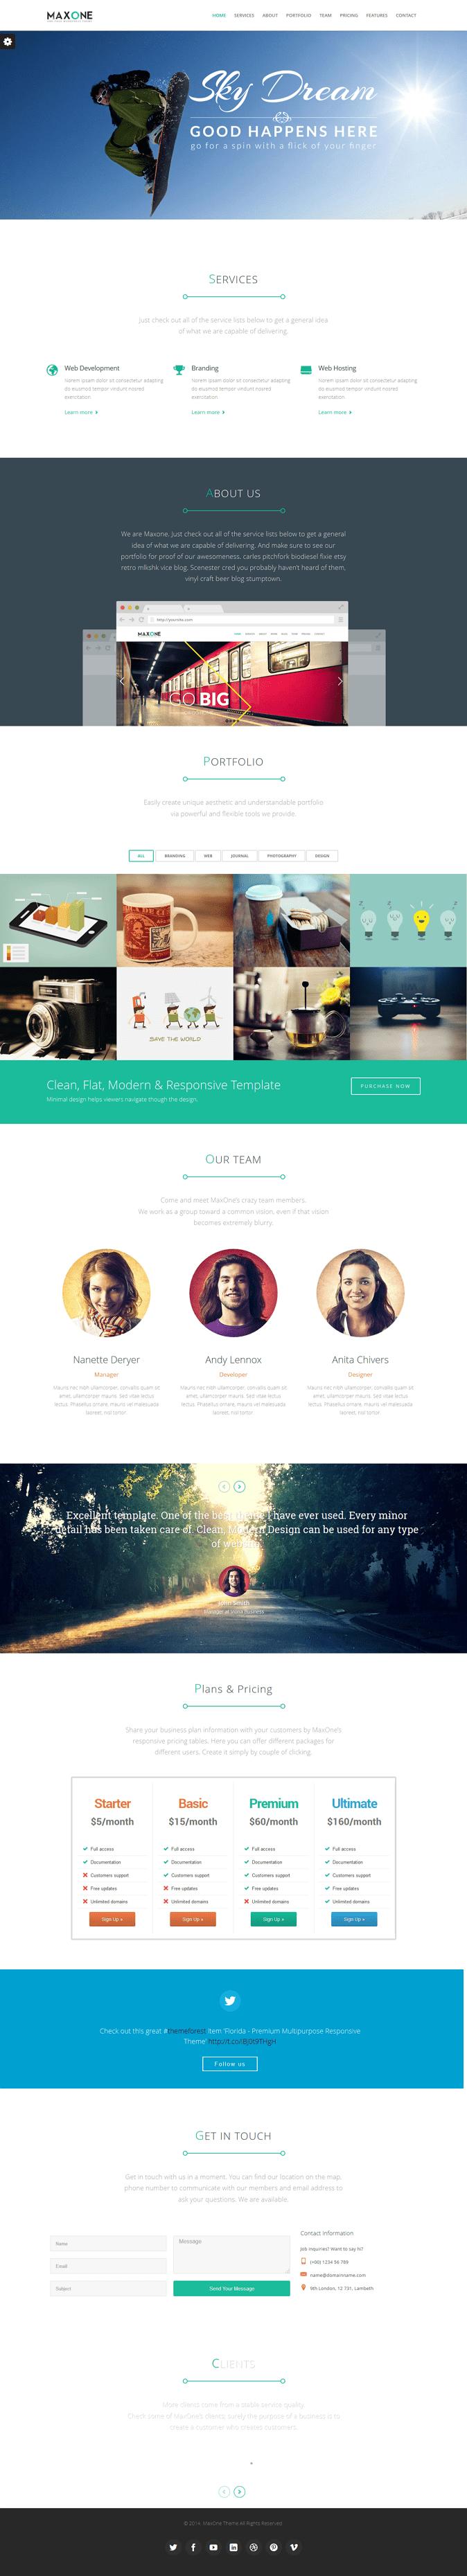 MaxOne is a Responsive, Retina-Ready One-page #WordPress theme with a minimalist, simple, #elega ...